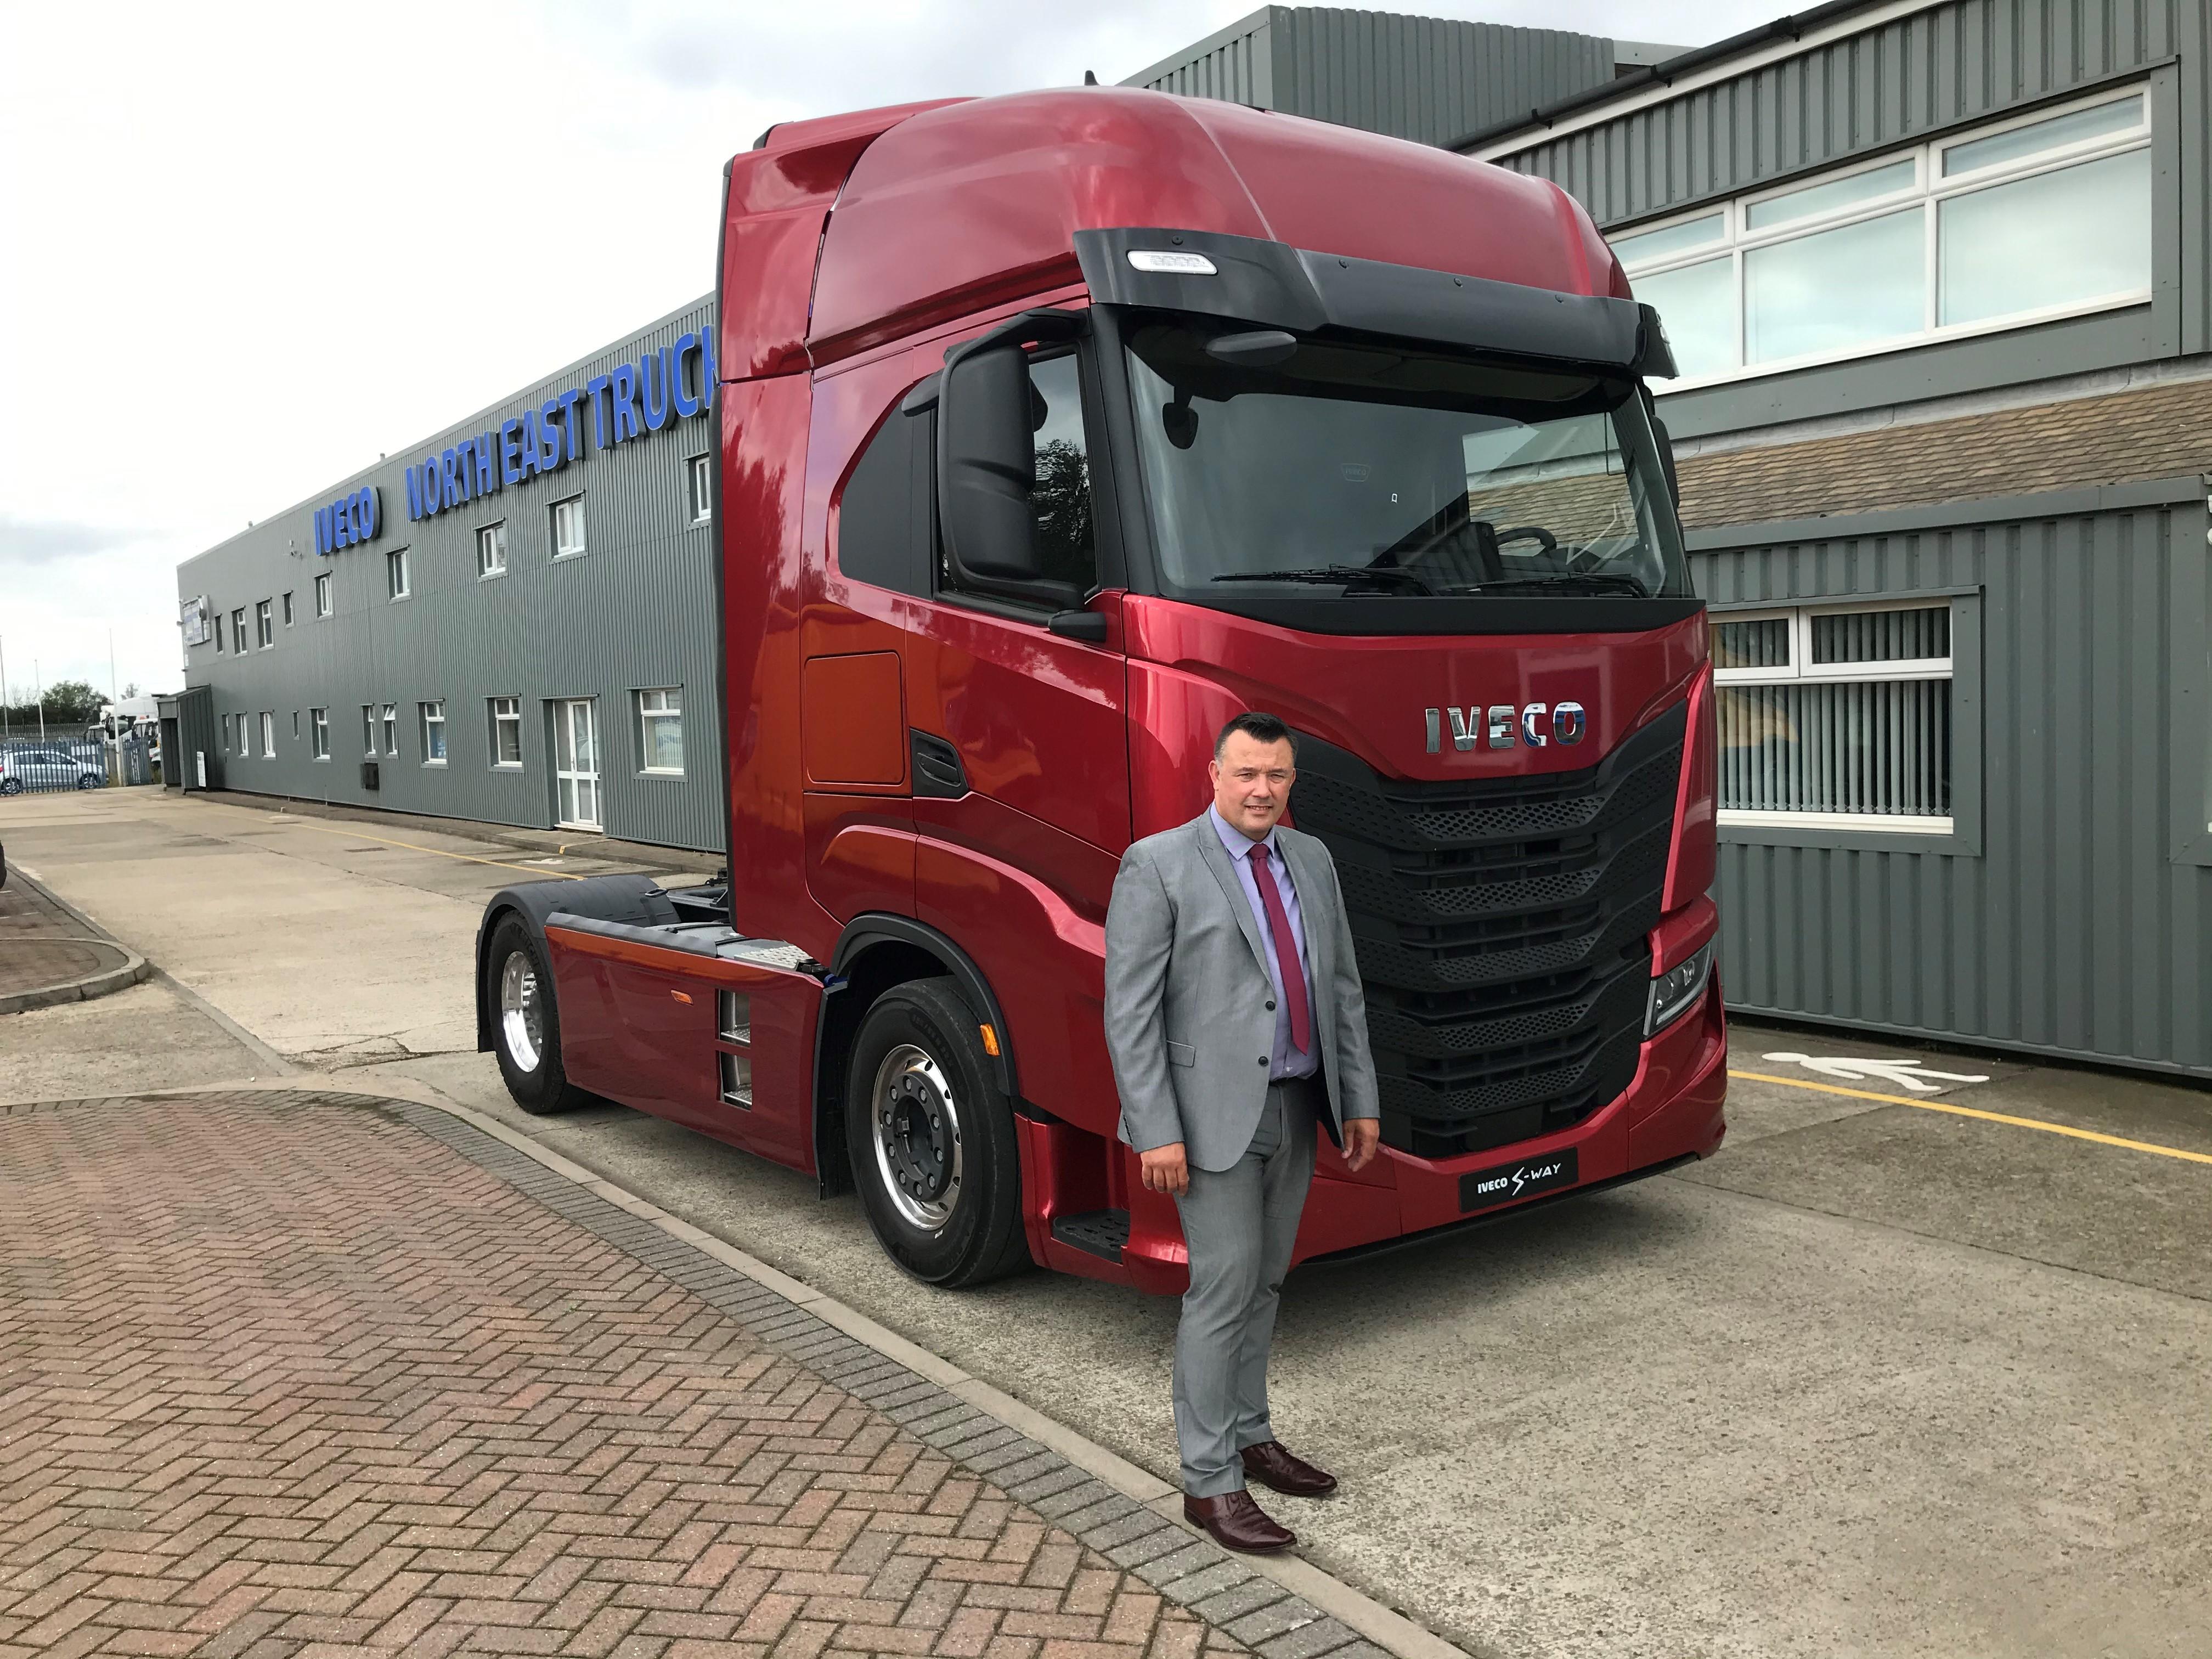 Fleet Business Development Manager joins North East Truck and Van